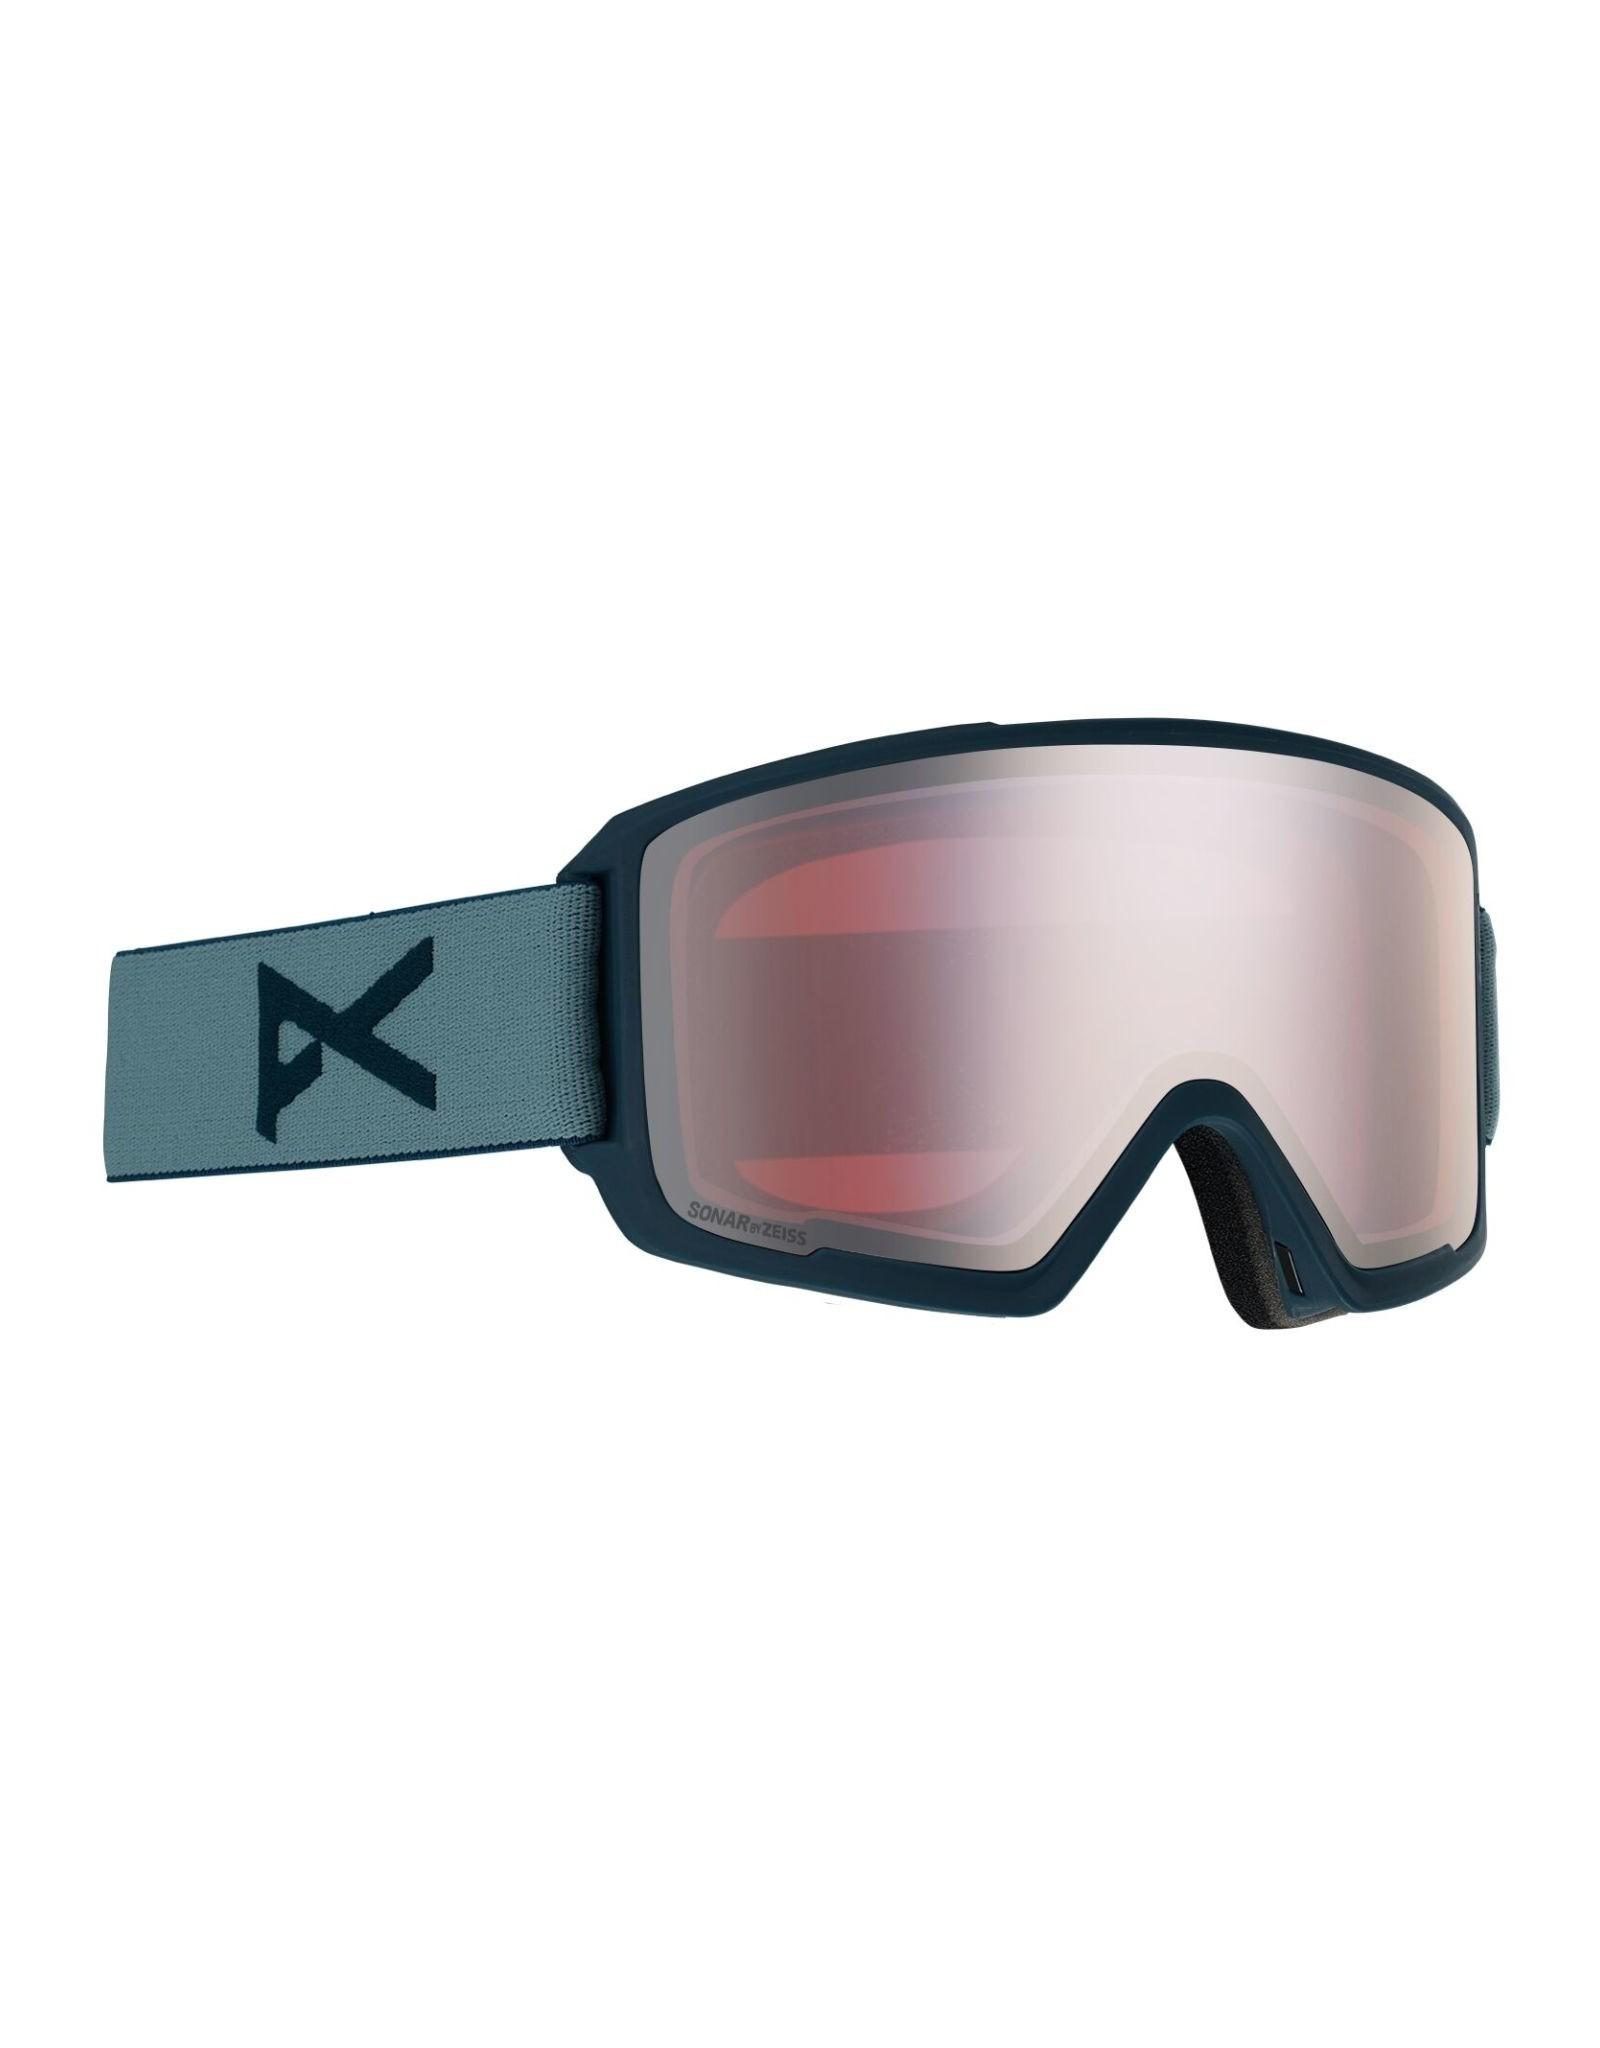 Anon Anon Men's M3 Goggle + Spare Lens